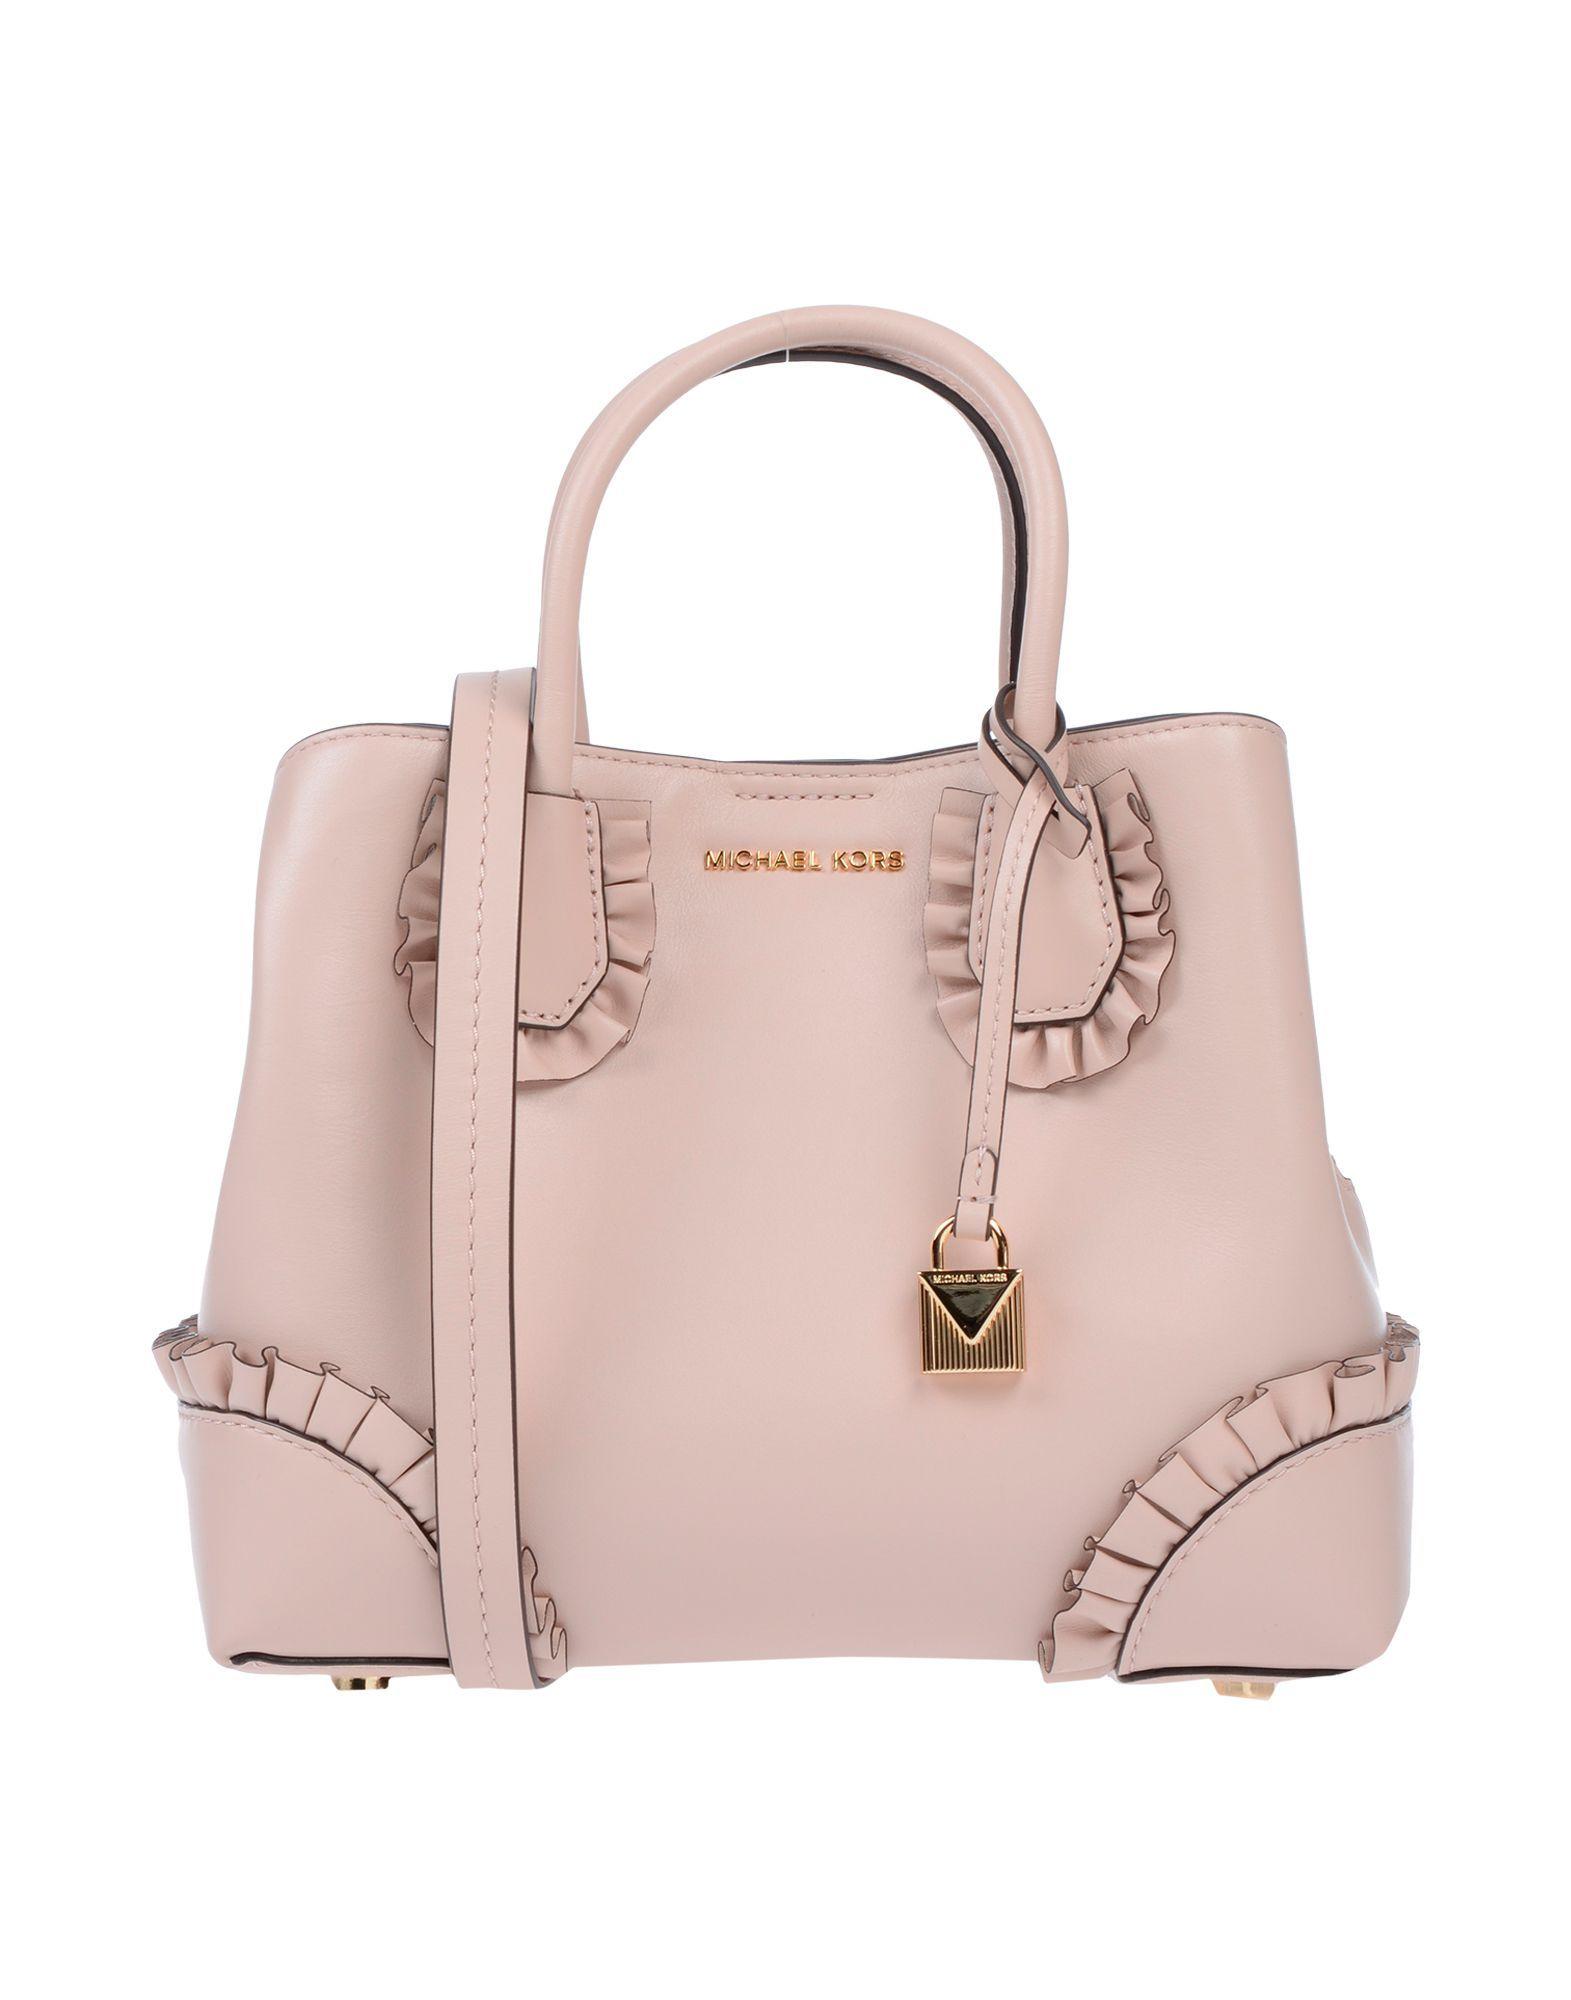 064a42476b76 Michael Kors Handbag - Women Michael Kors Handbags online on YOOX United  States - 45446674TK